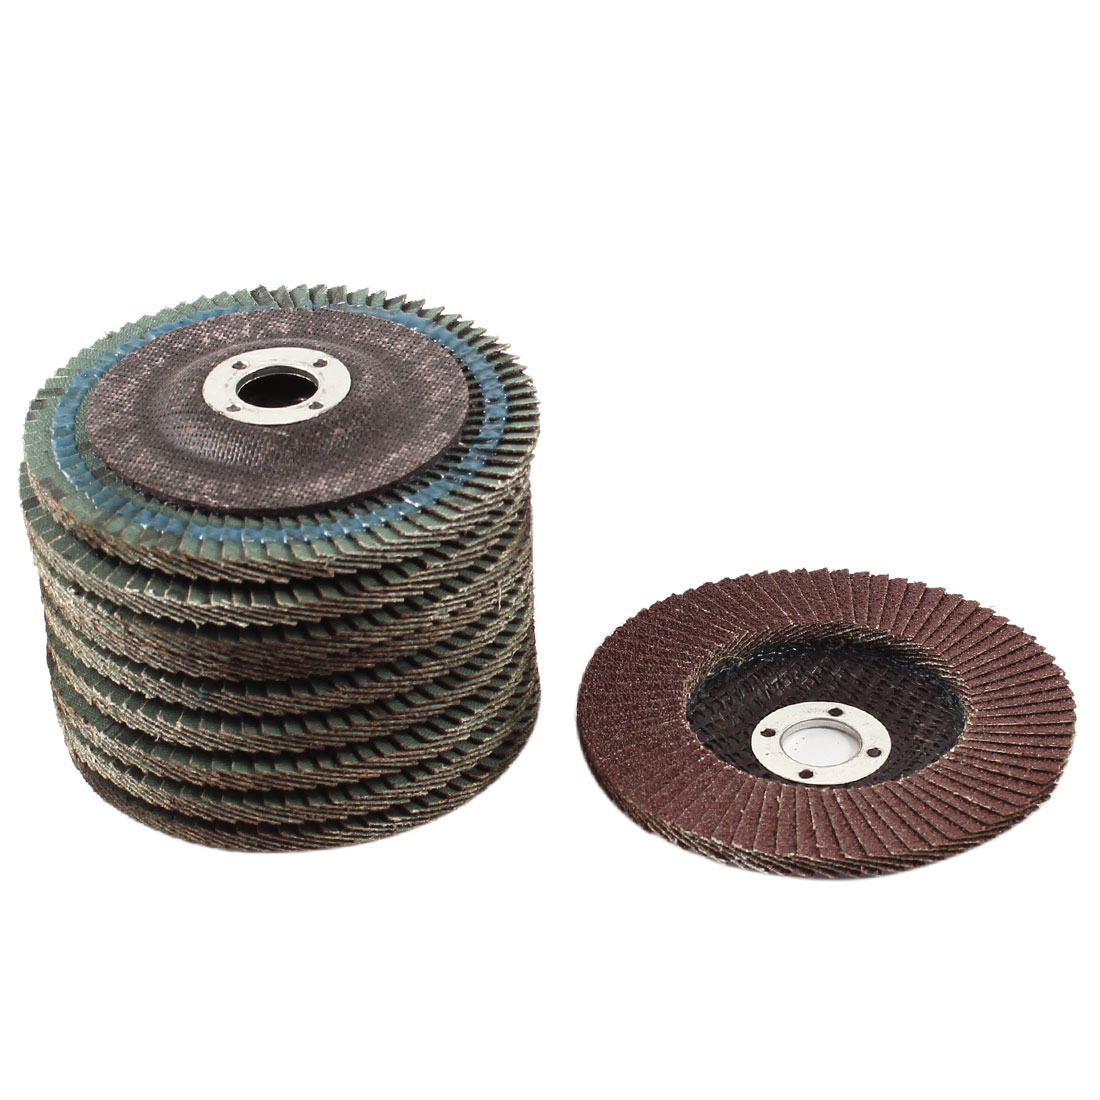 Metal Polishing 100mm Dia 80# Flap Sanding Abrasive Wheels Discs 10Pcs